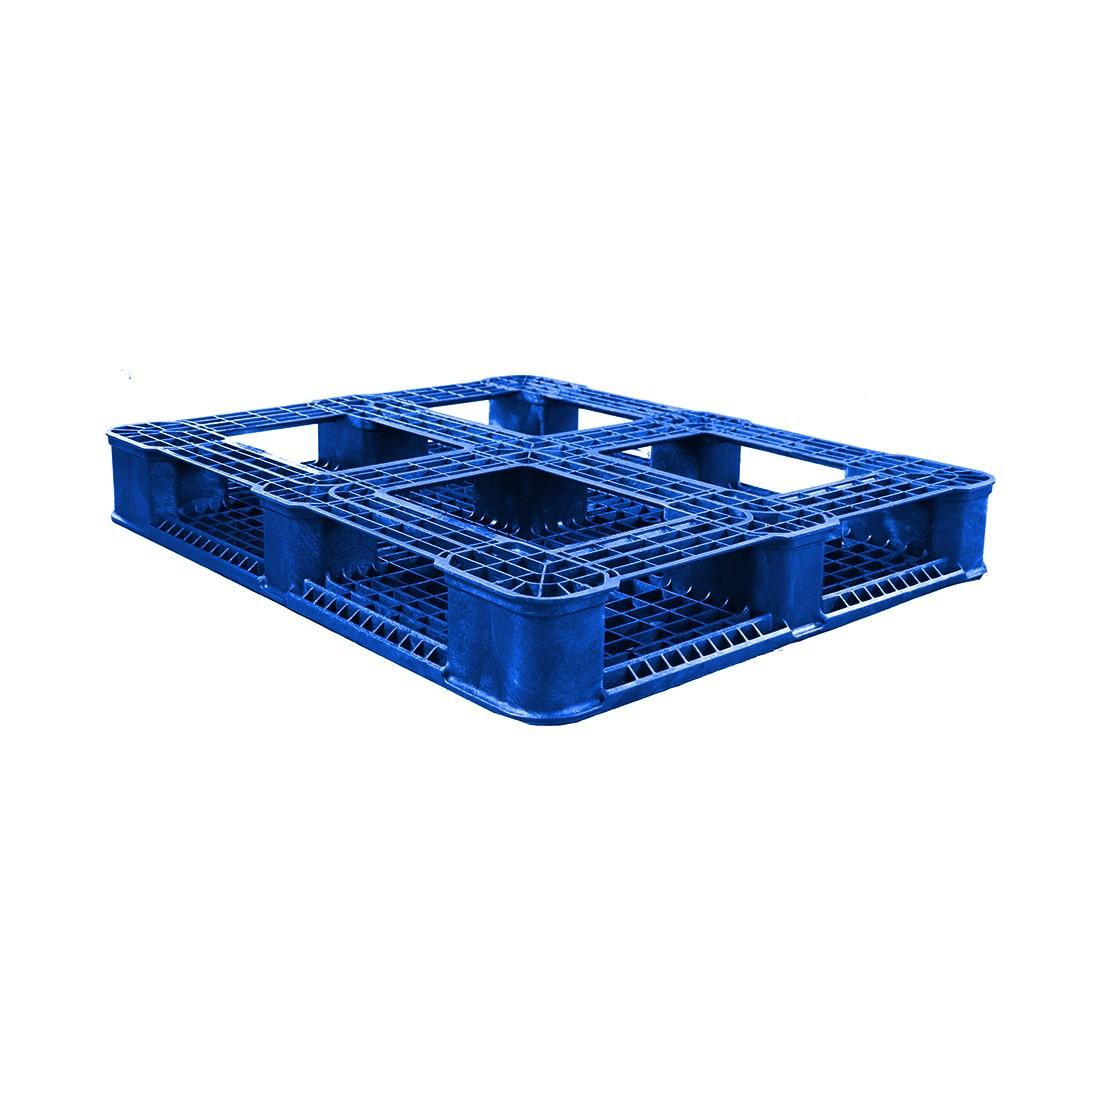 40 x 48 Rackable Plastic FDA Approved Solid Deck Plastic Pallet - Blue